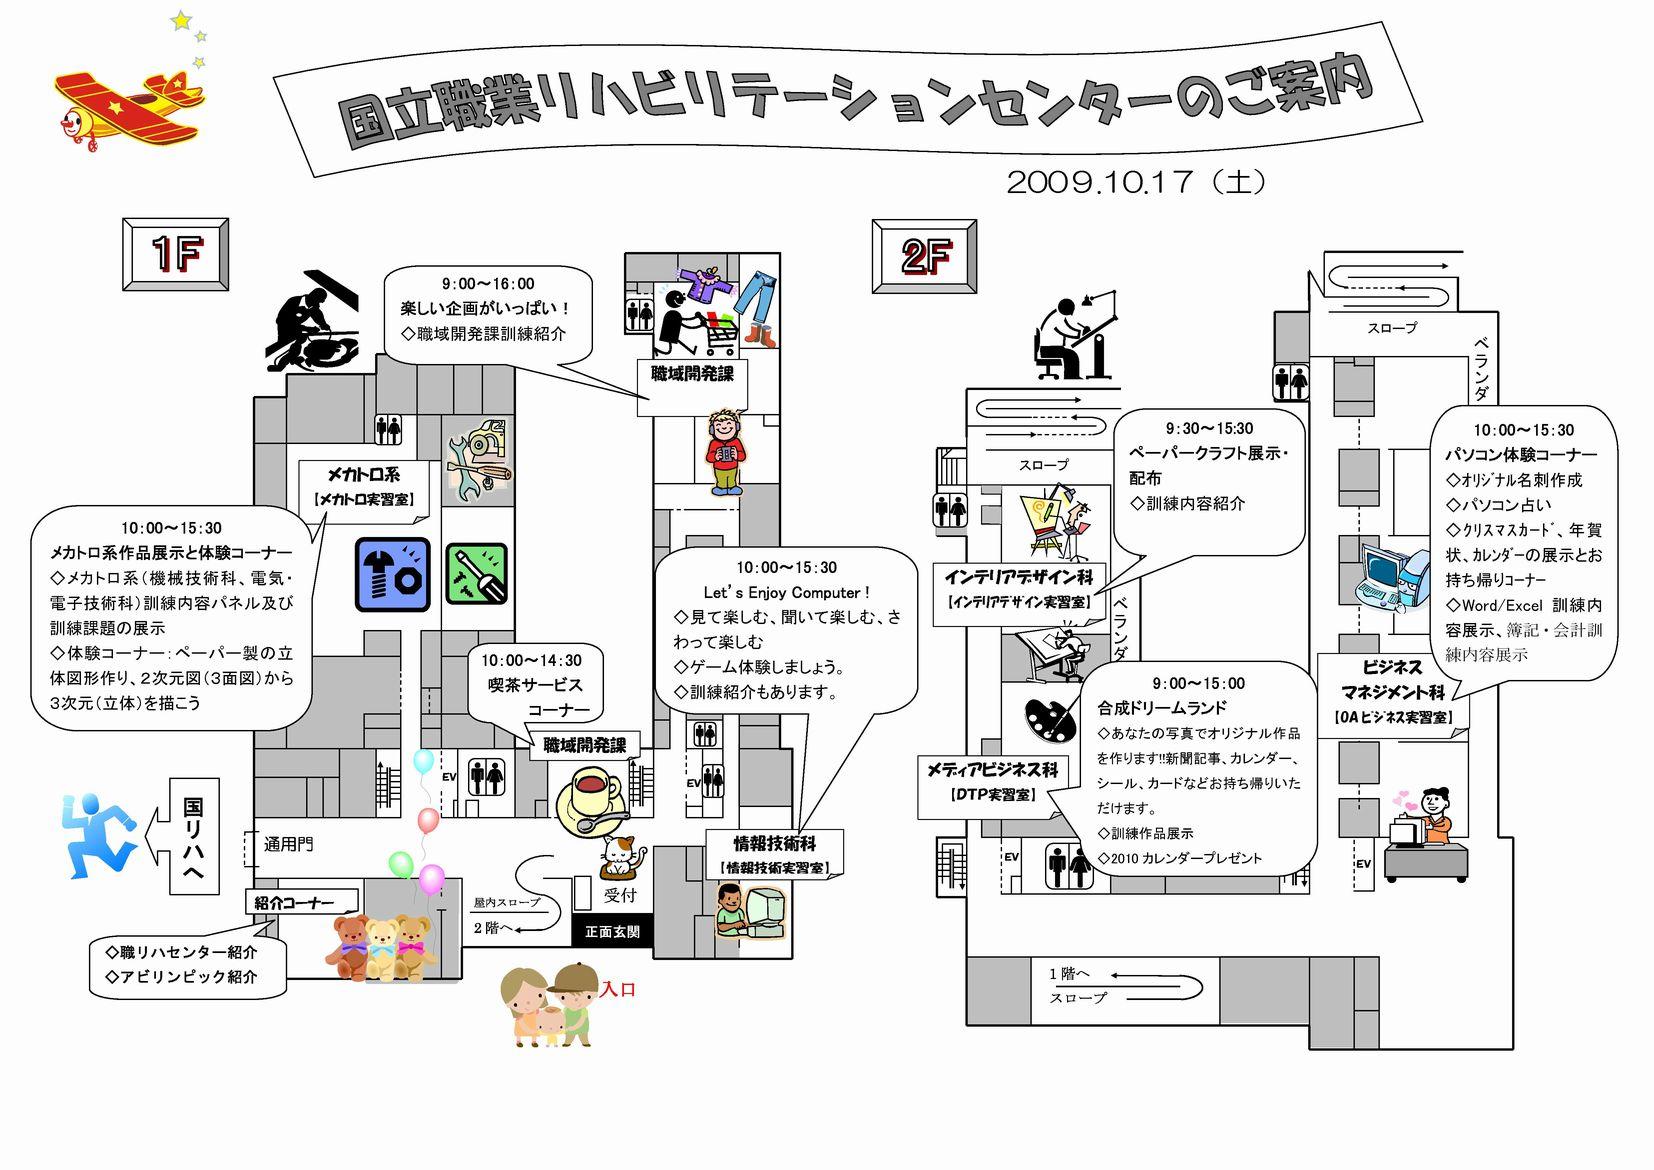 第30回 リハ並木祭 敷地内地図(...